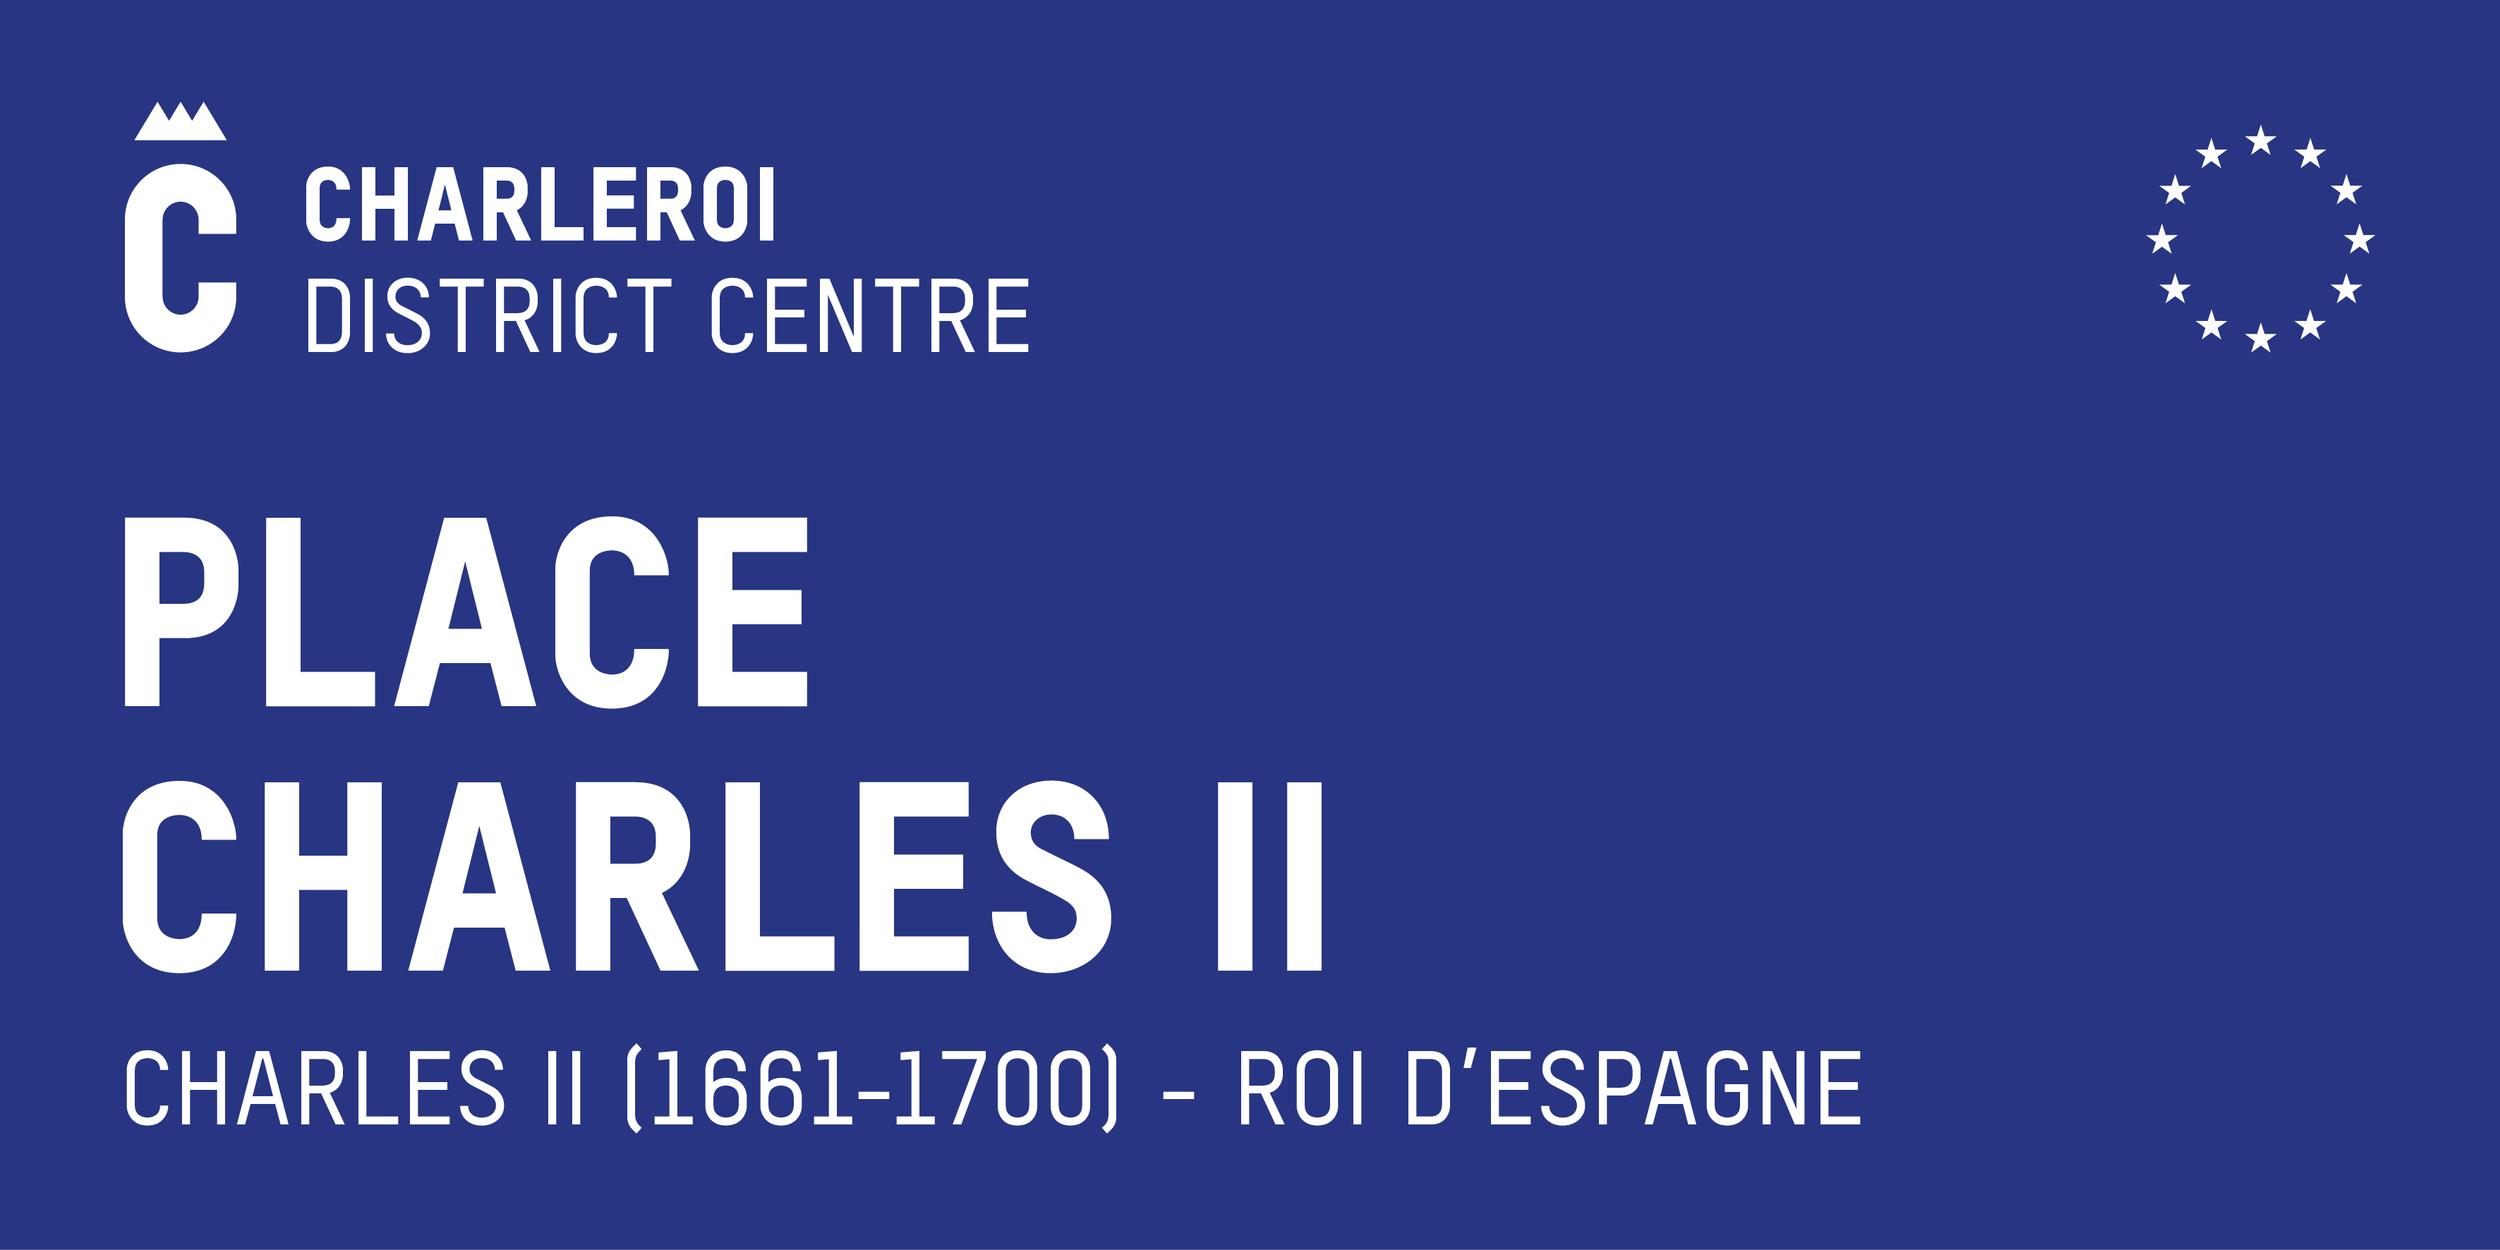 identite-charleroi-logo_plaque-de-rue